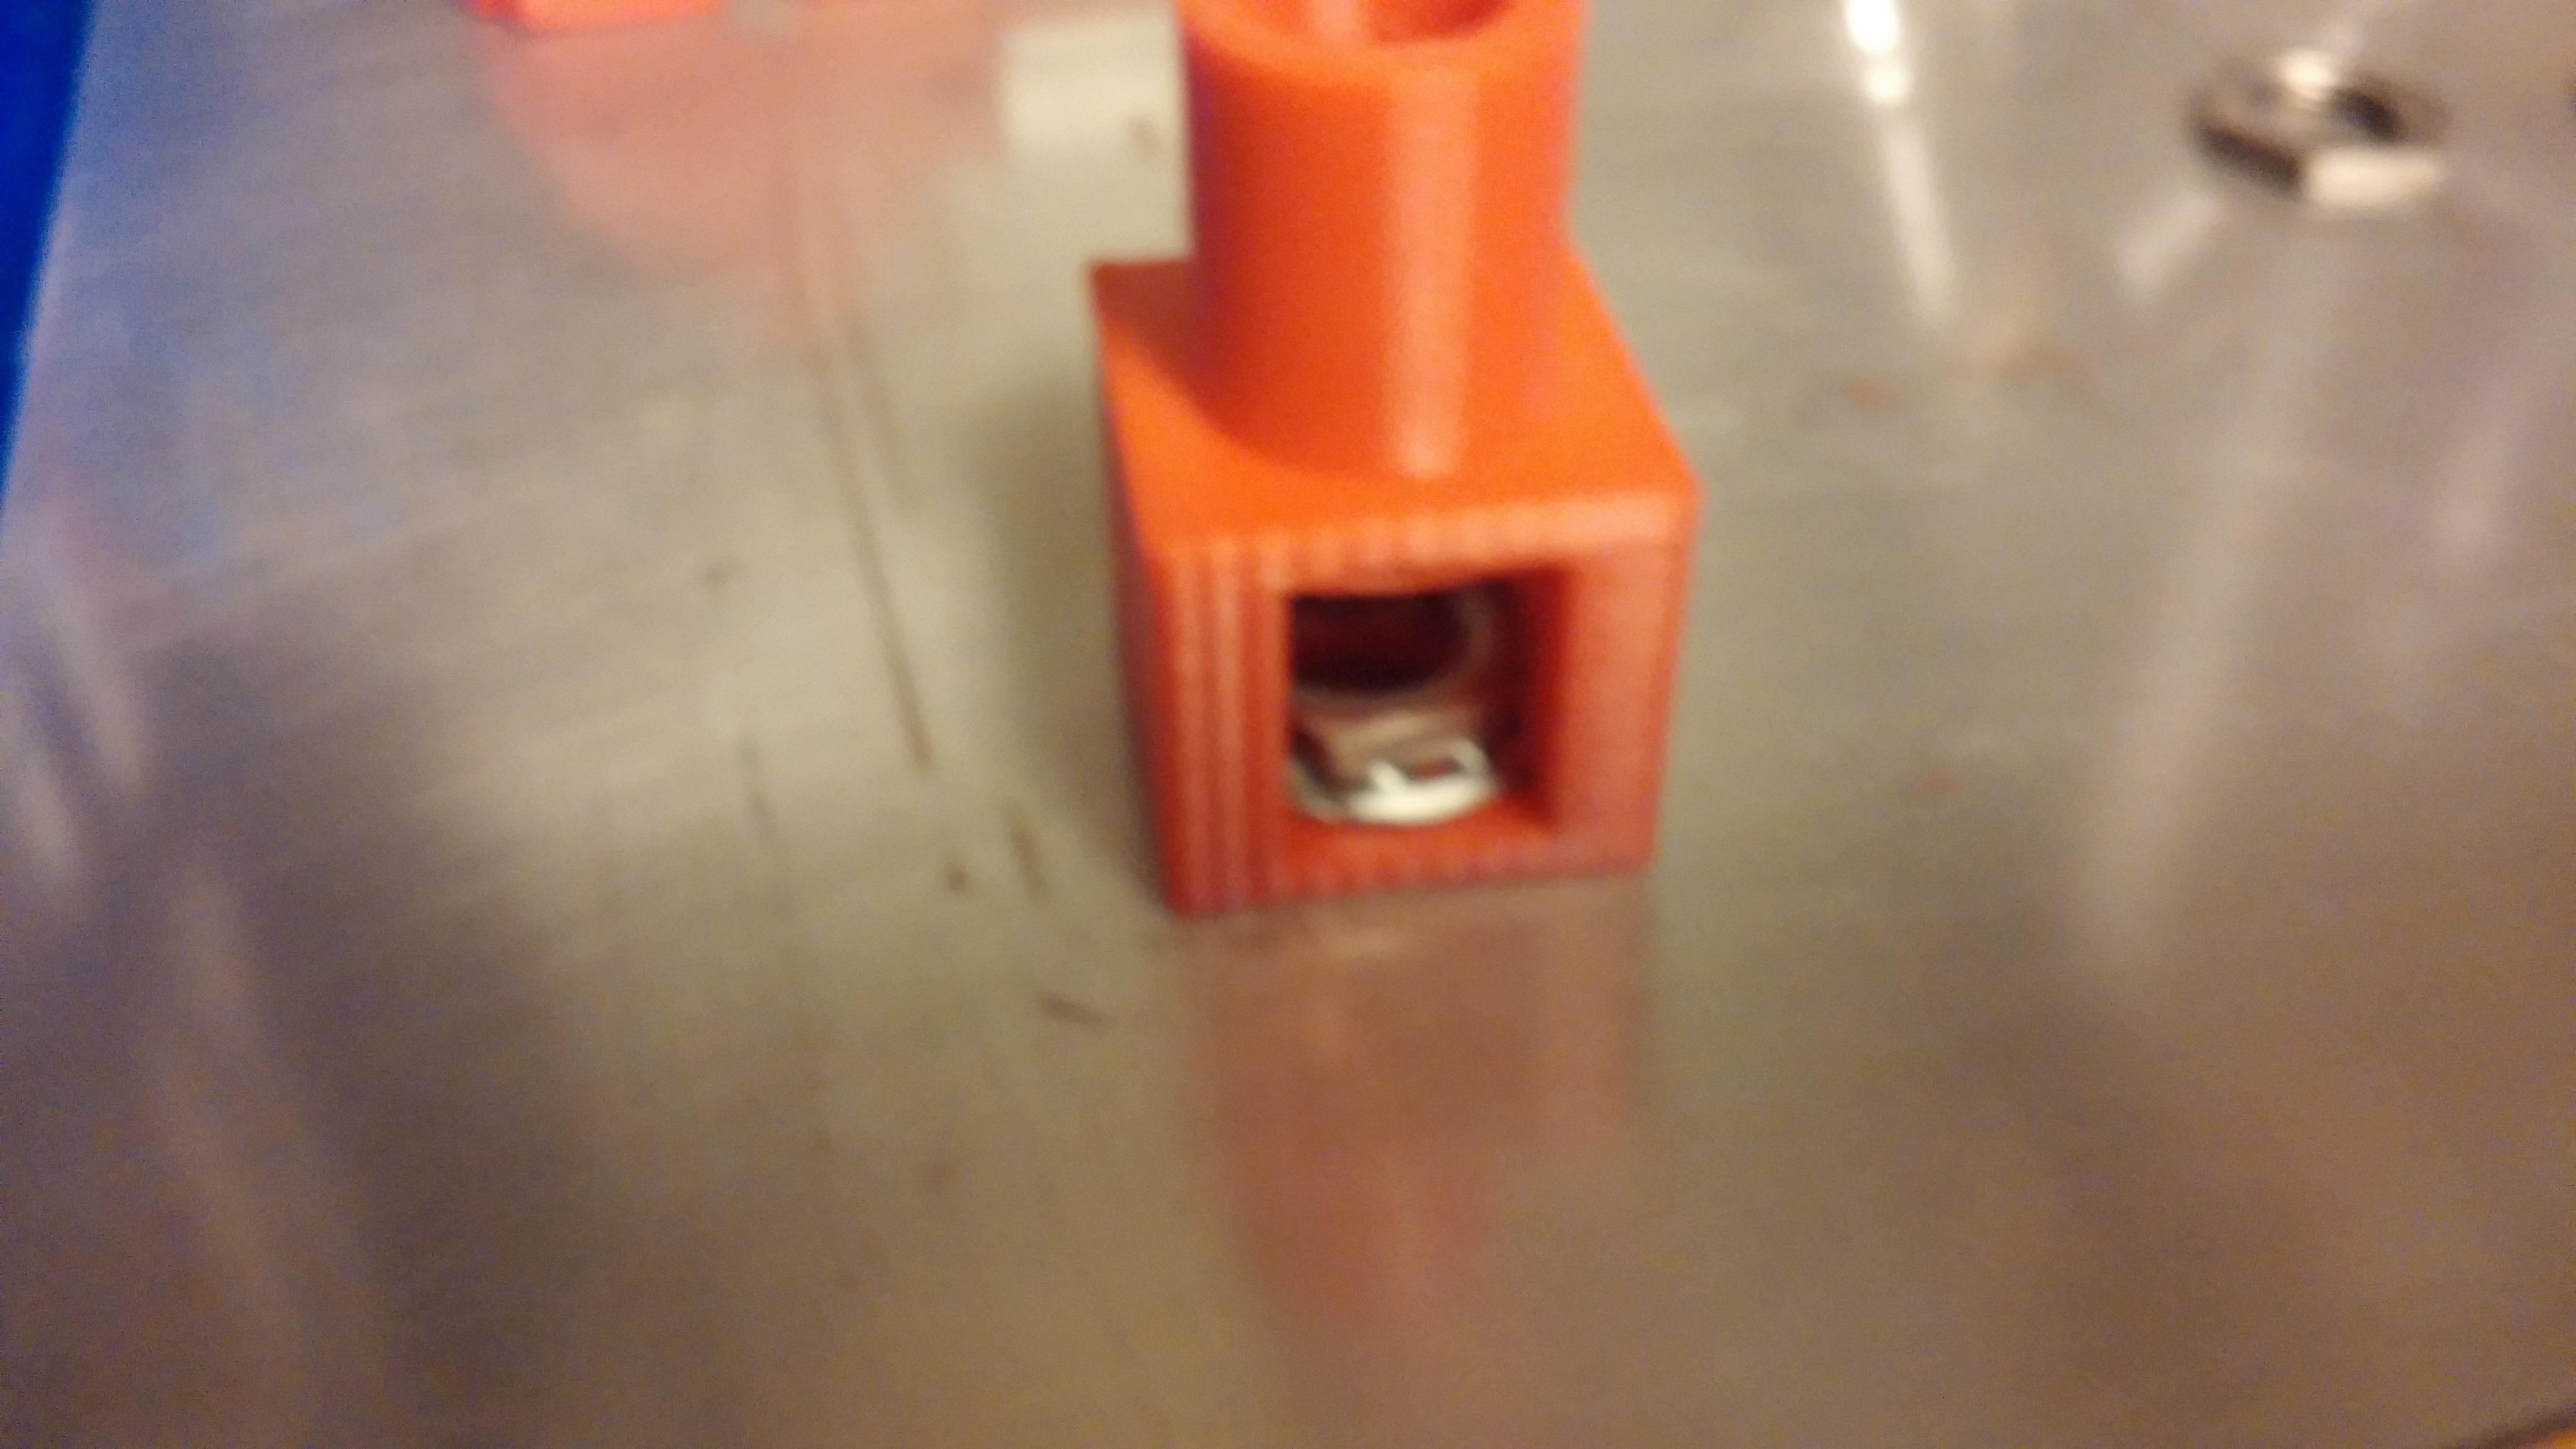 1110151853.jpg Download free STL file NCS P3-v Steel Reducing bushing adapter • 3D printing object, trentjw